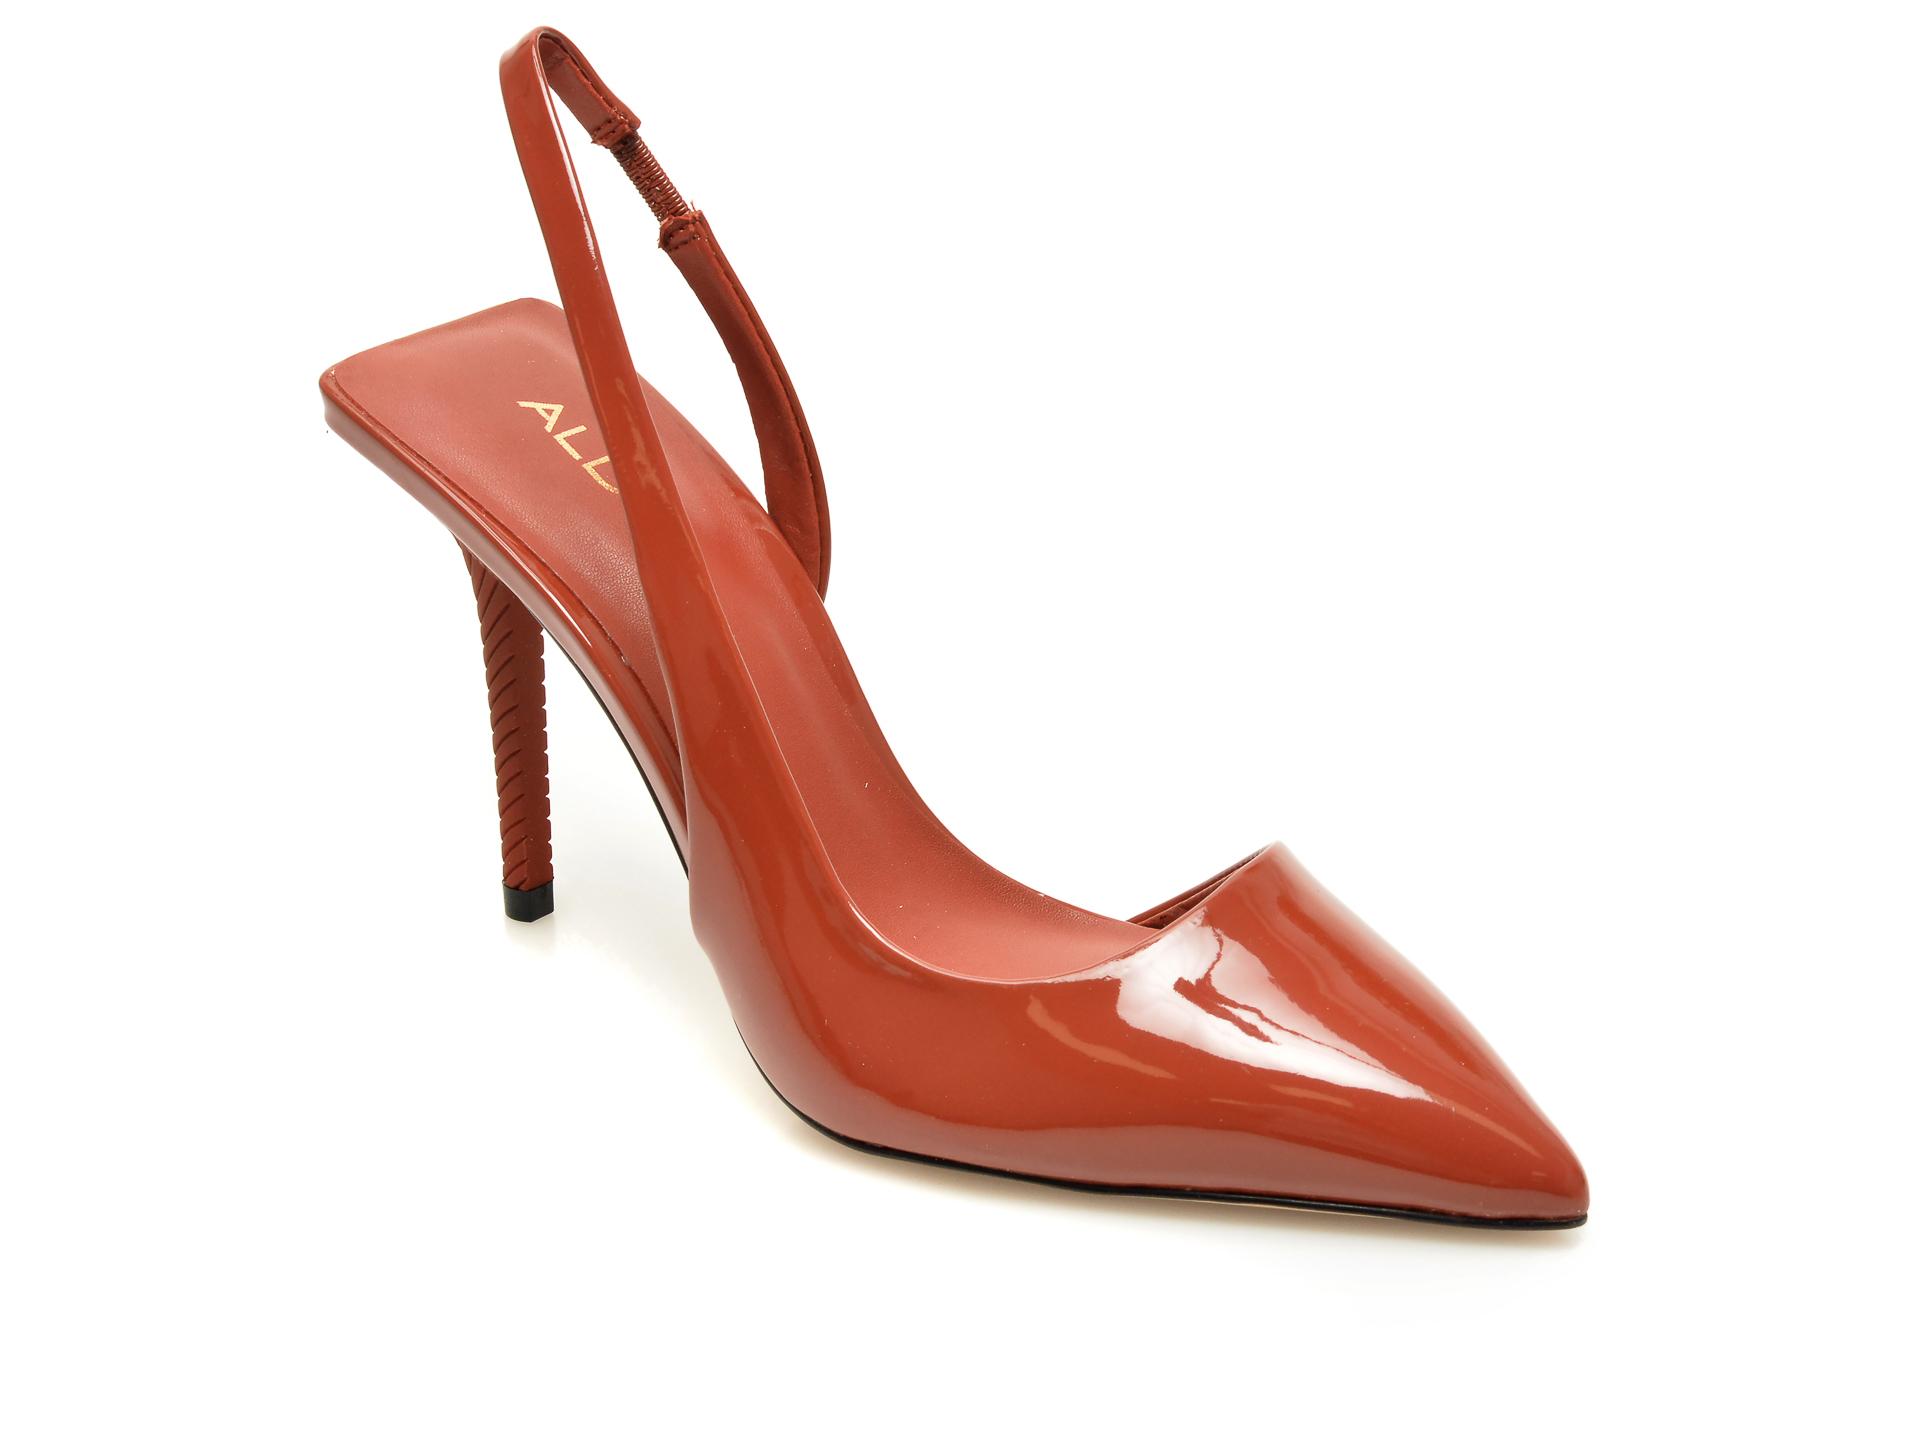 Pantofi ALDO rosii, Tirarith600, din piele ecologica imagine otter.ro